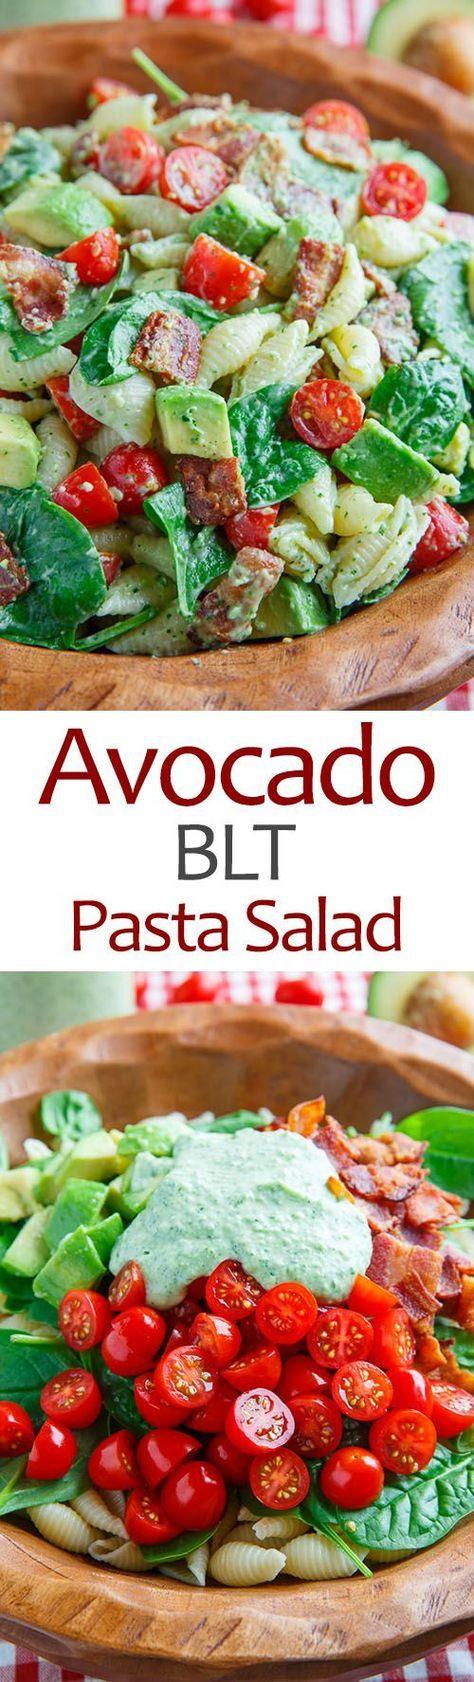 Avocado BLT Pasta Salad